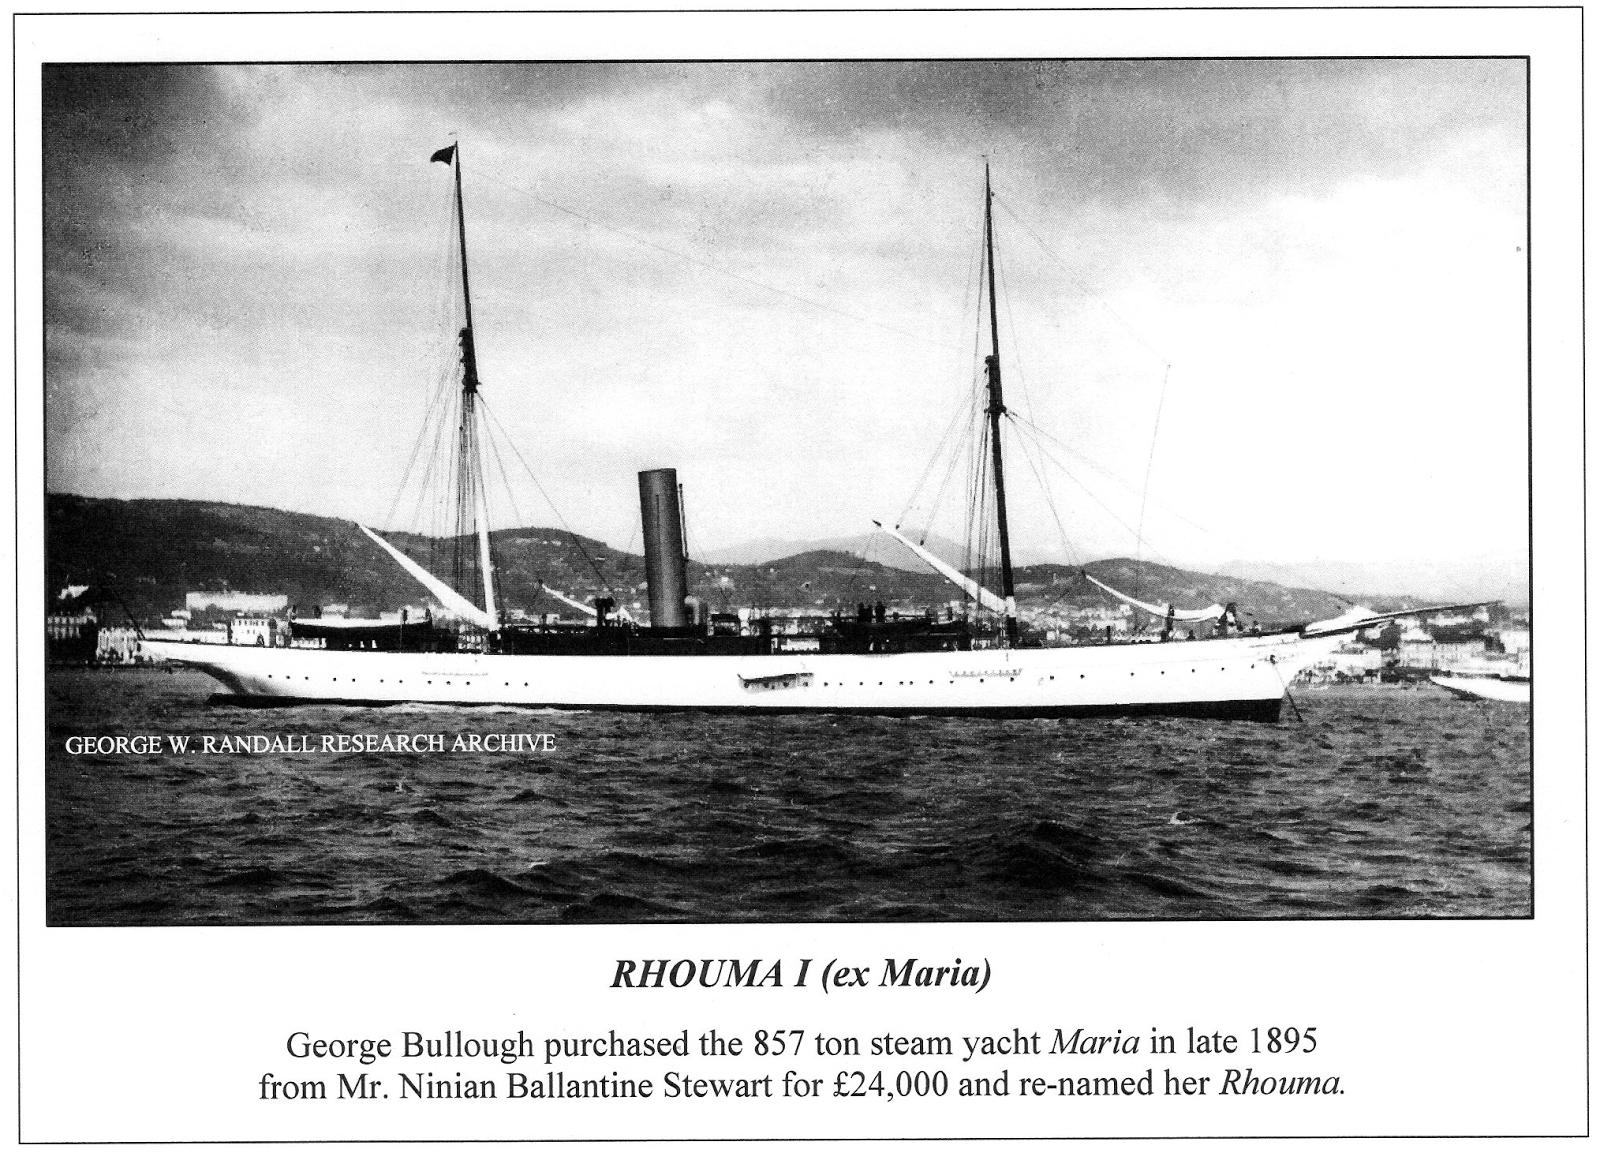 the life history of sir george bullough's steam yacht rhouma i